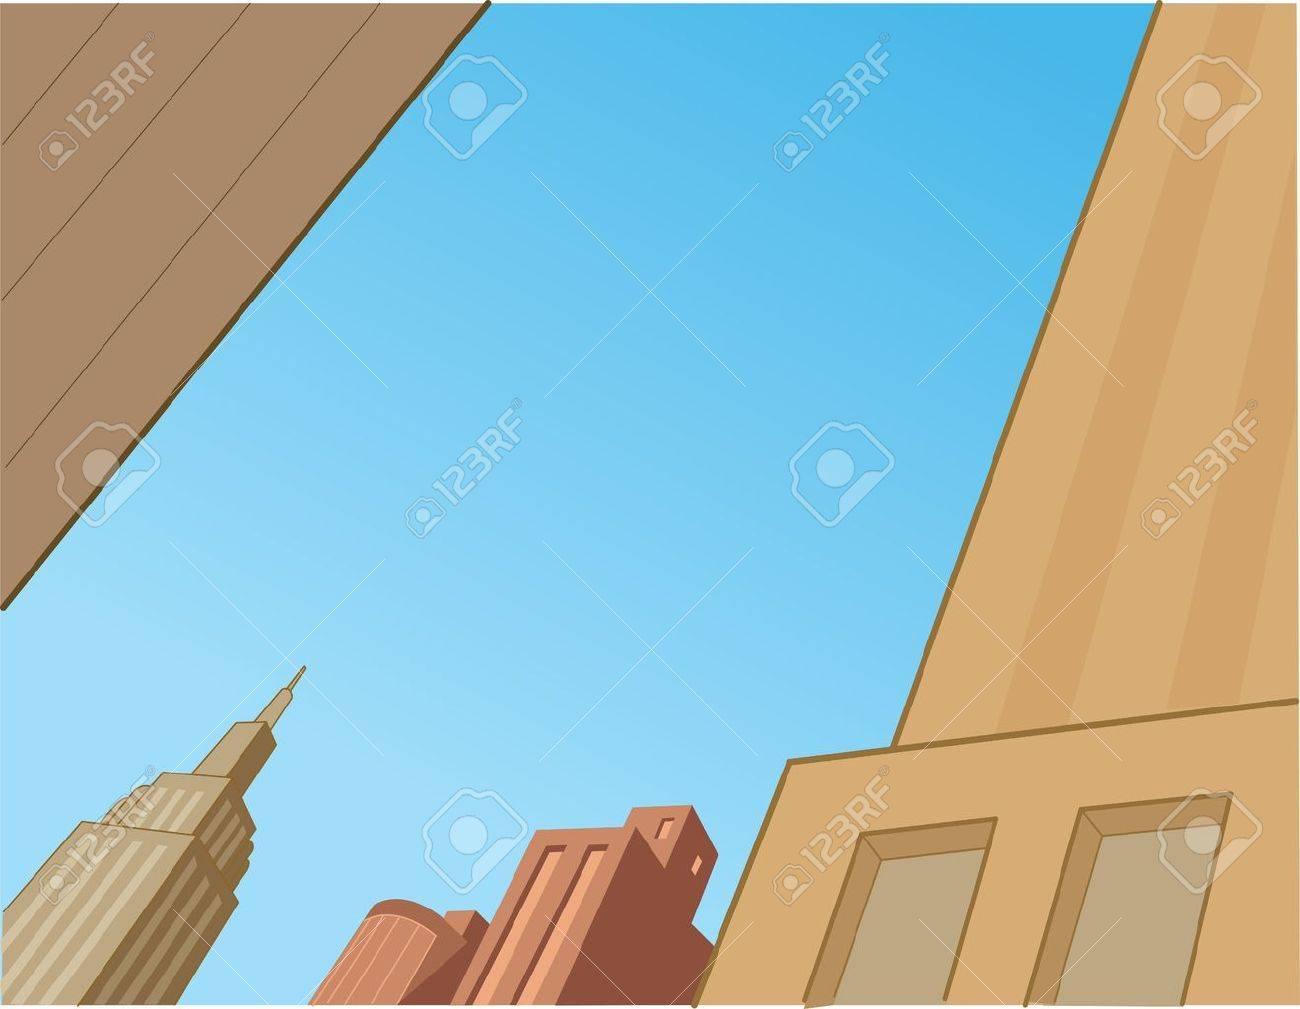 City Sky Scene Background for Superhero Comics and Animation Stock Vector - 21536032